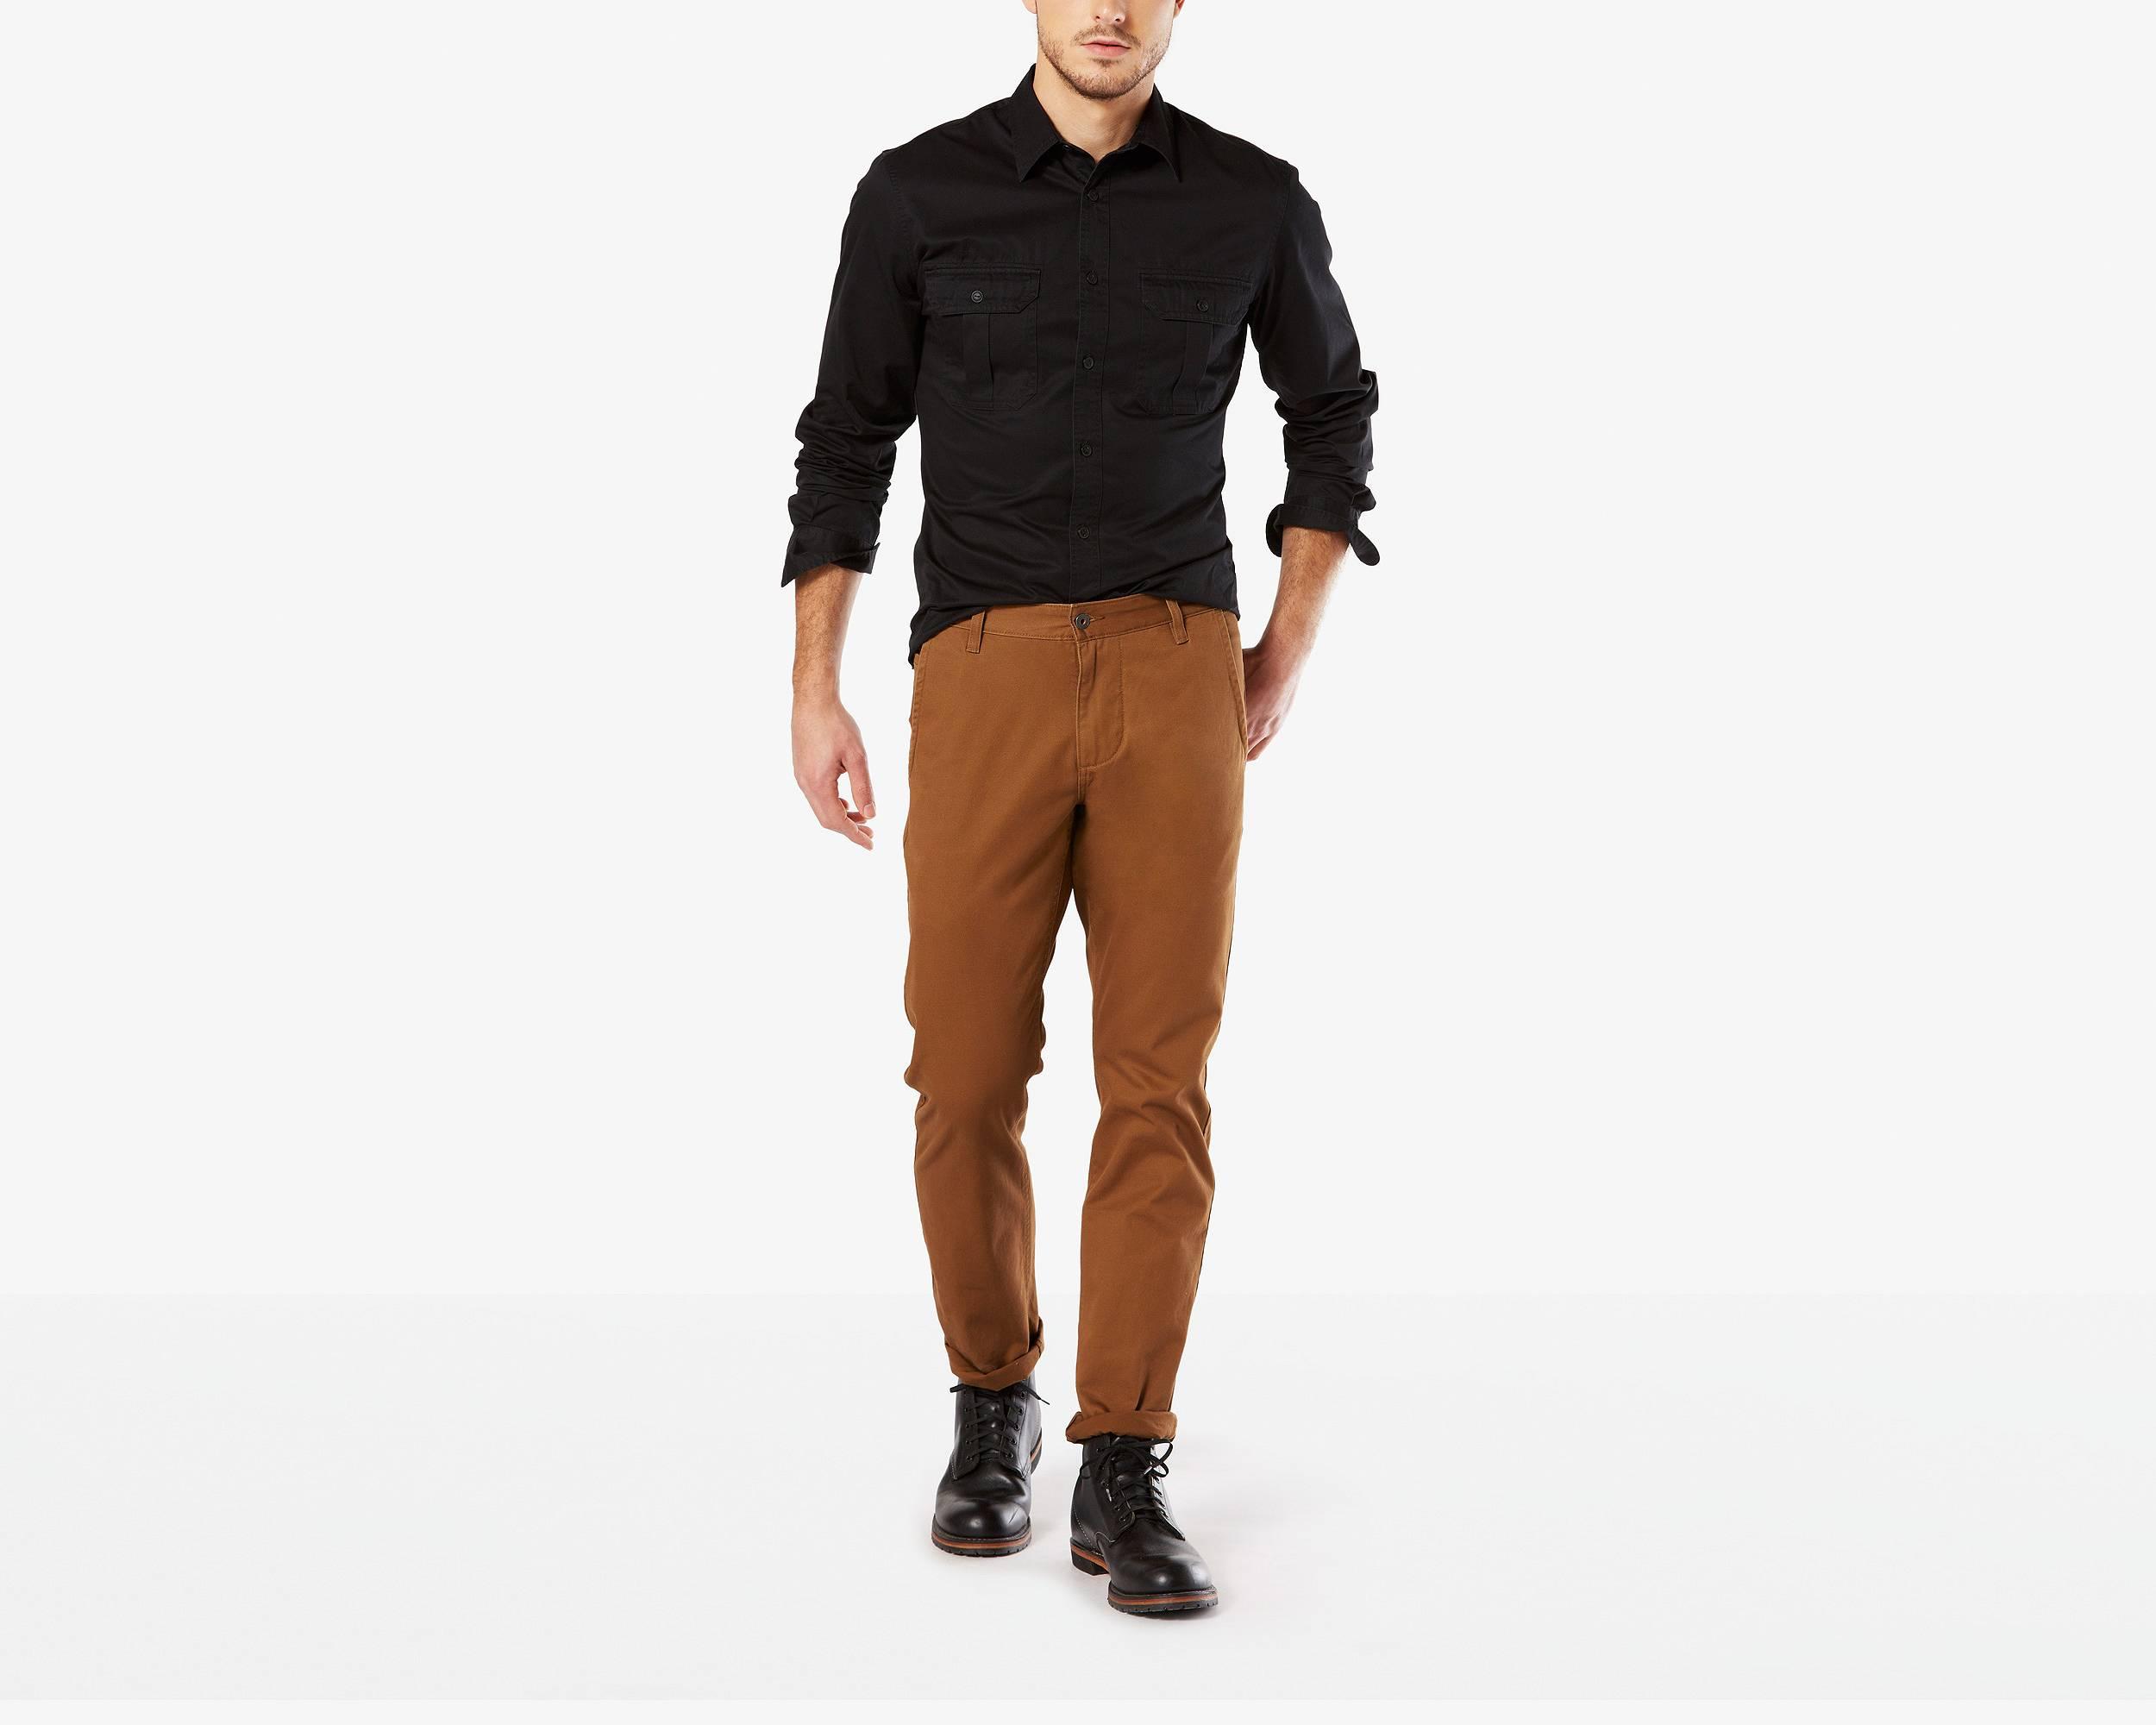 Men's Casual Pants - Casual Cargo & Khaki Pants | Dockers